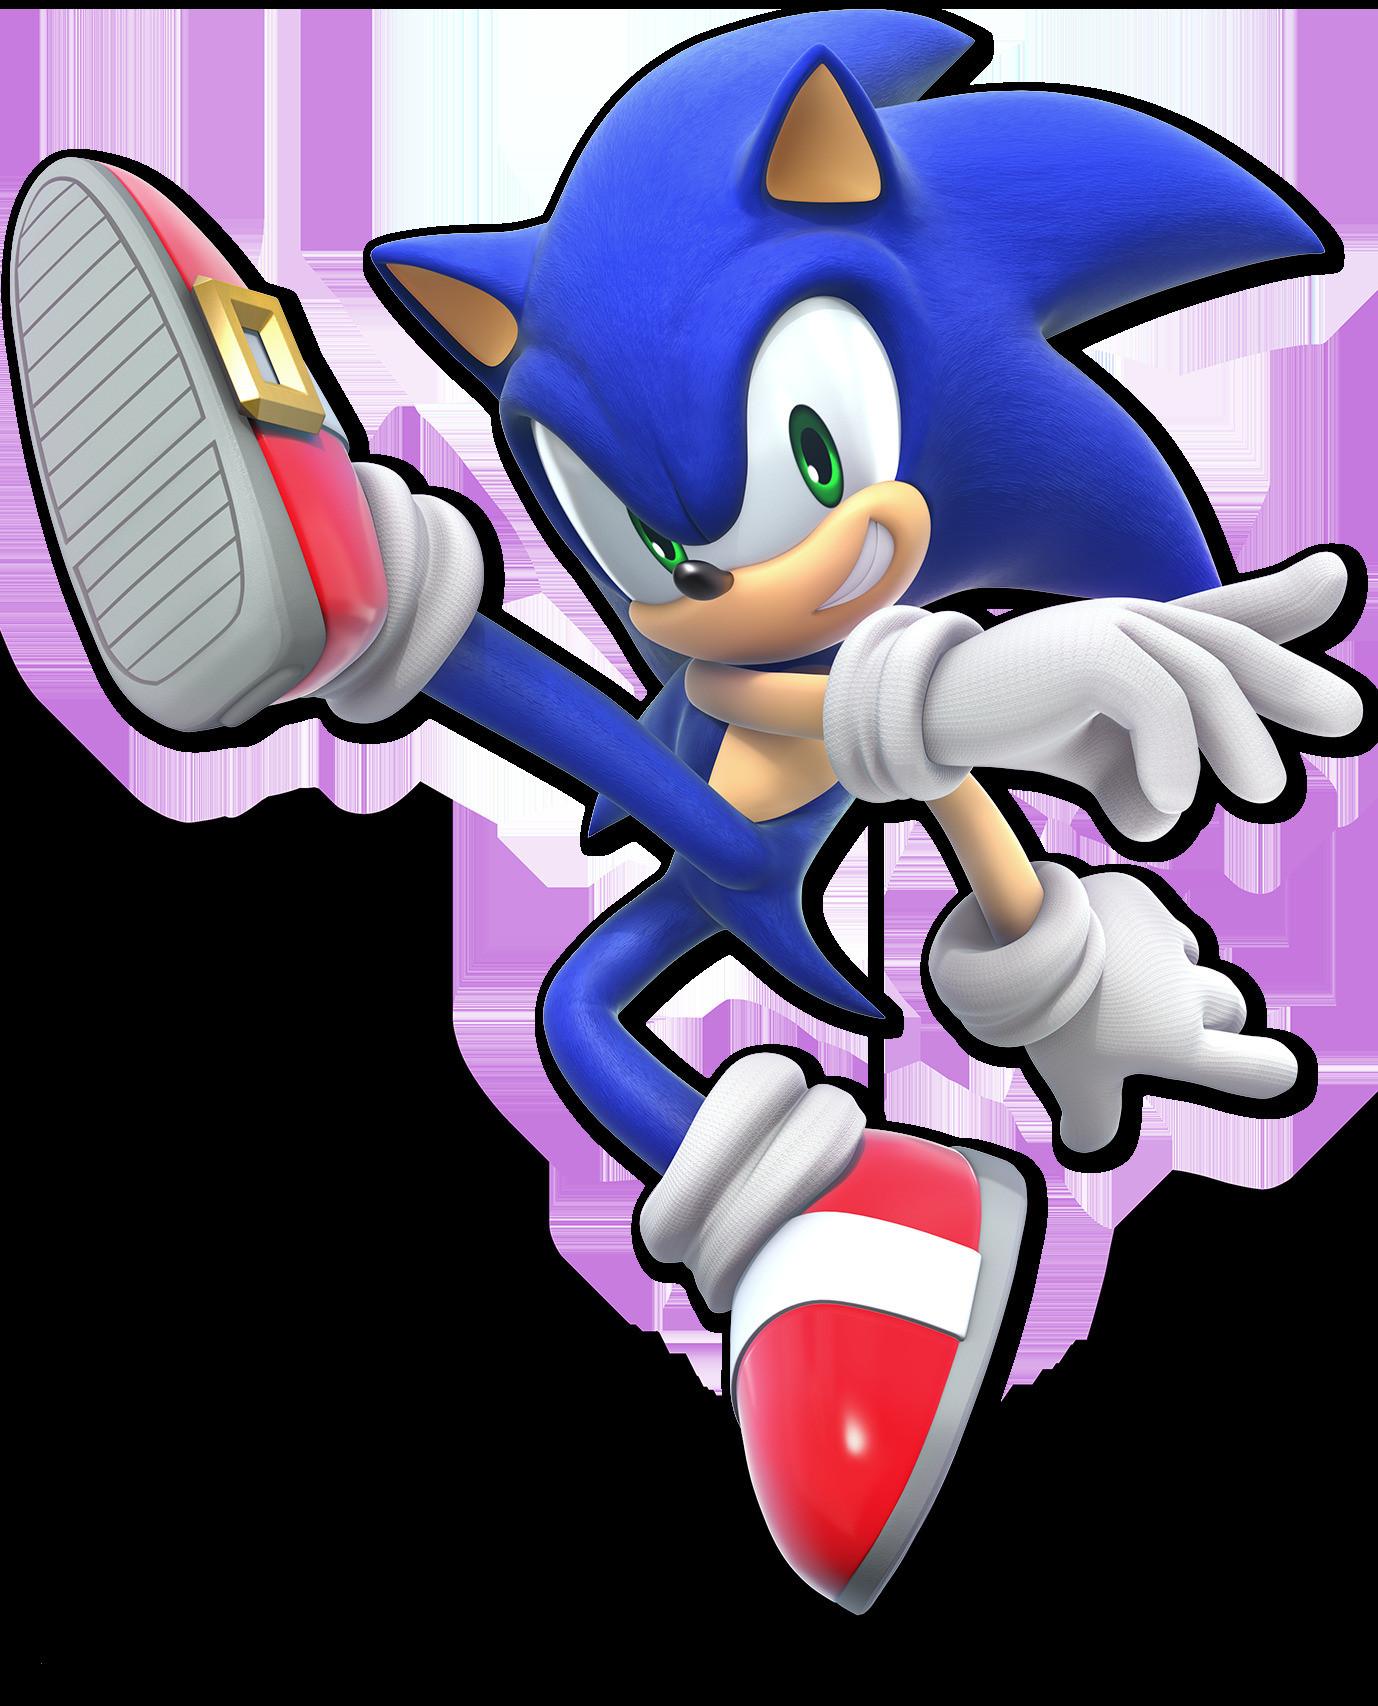 Sonic the Hedgehog Ausmalbilder Neu 45 Elegant sonic the Hedgehog Ausmalbilder Beste Malvorlage Das Bild